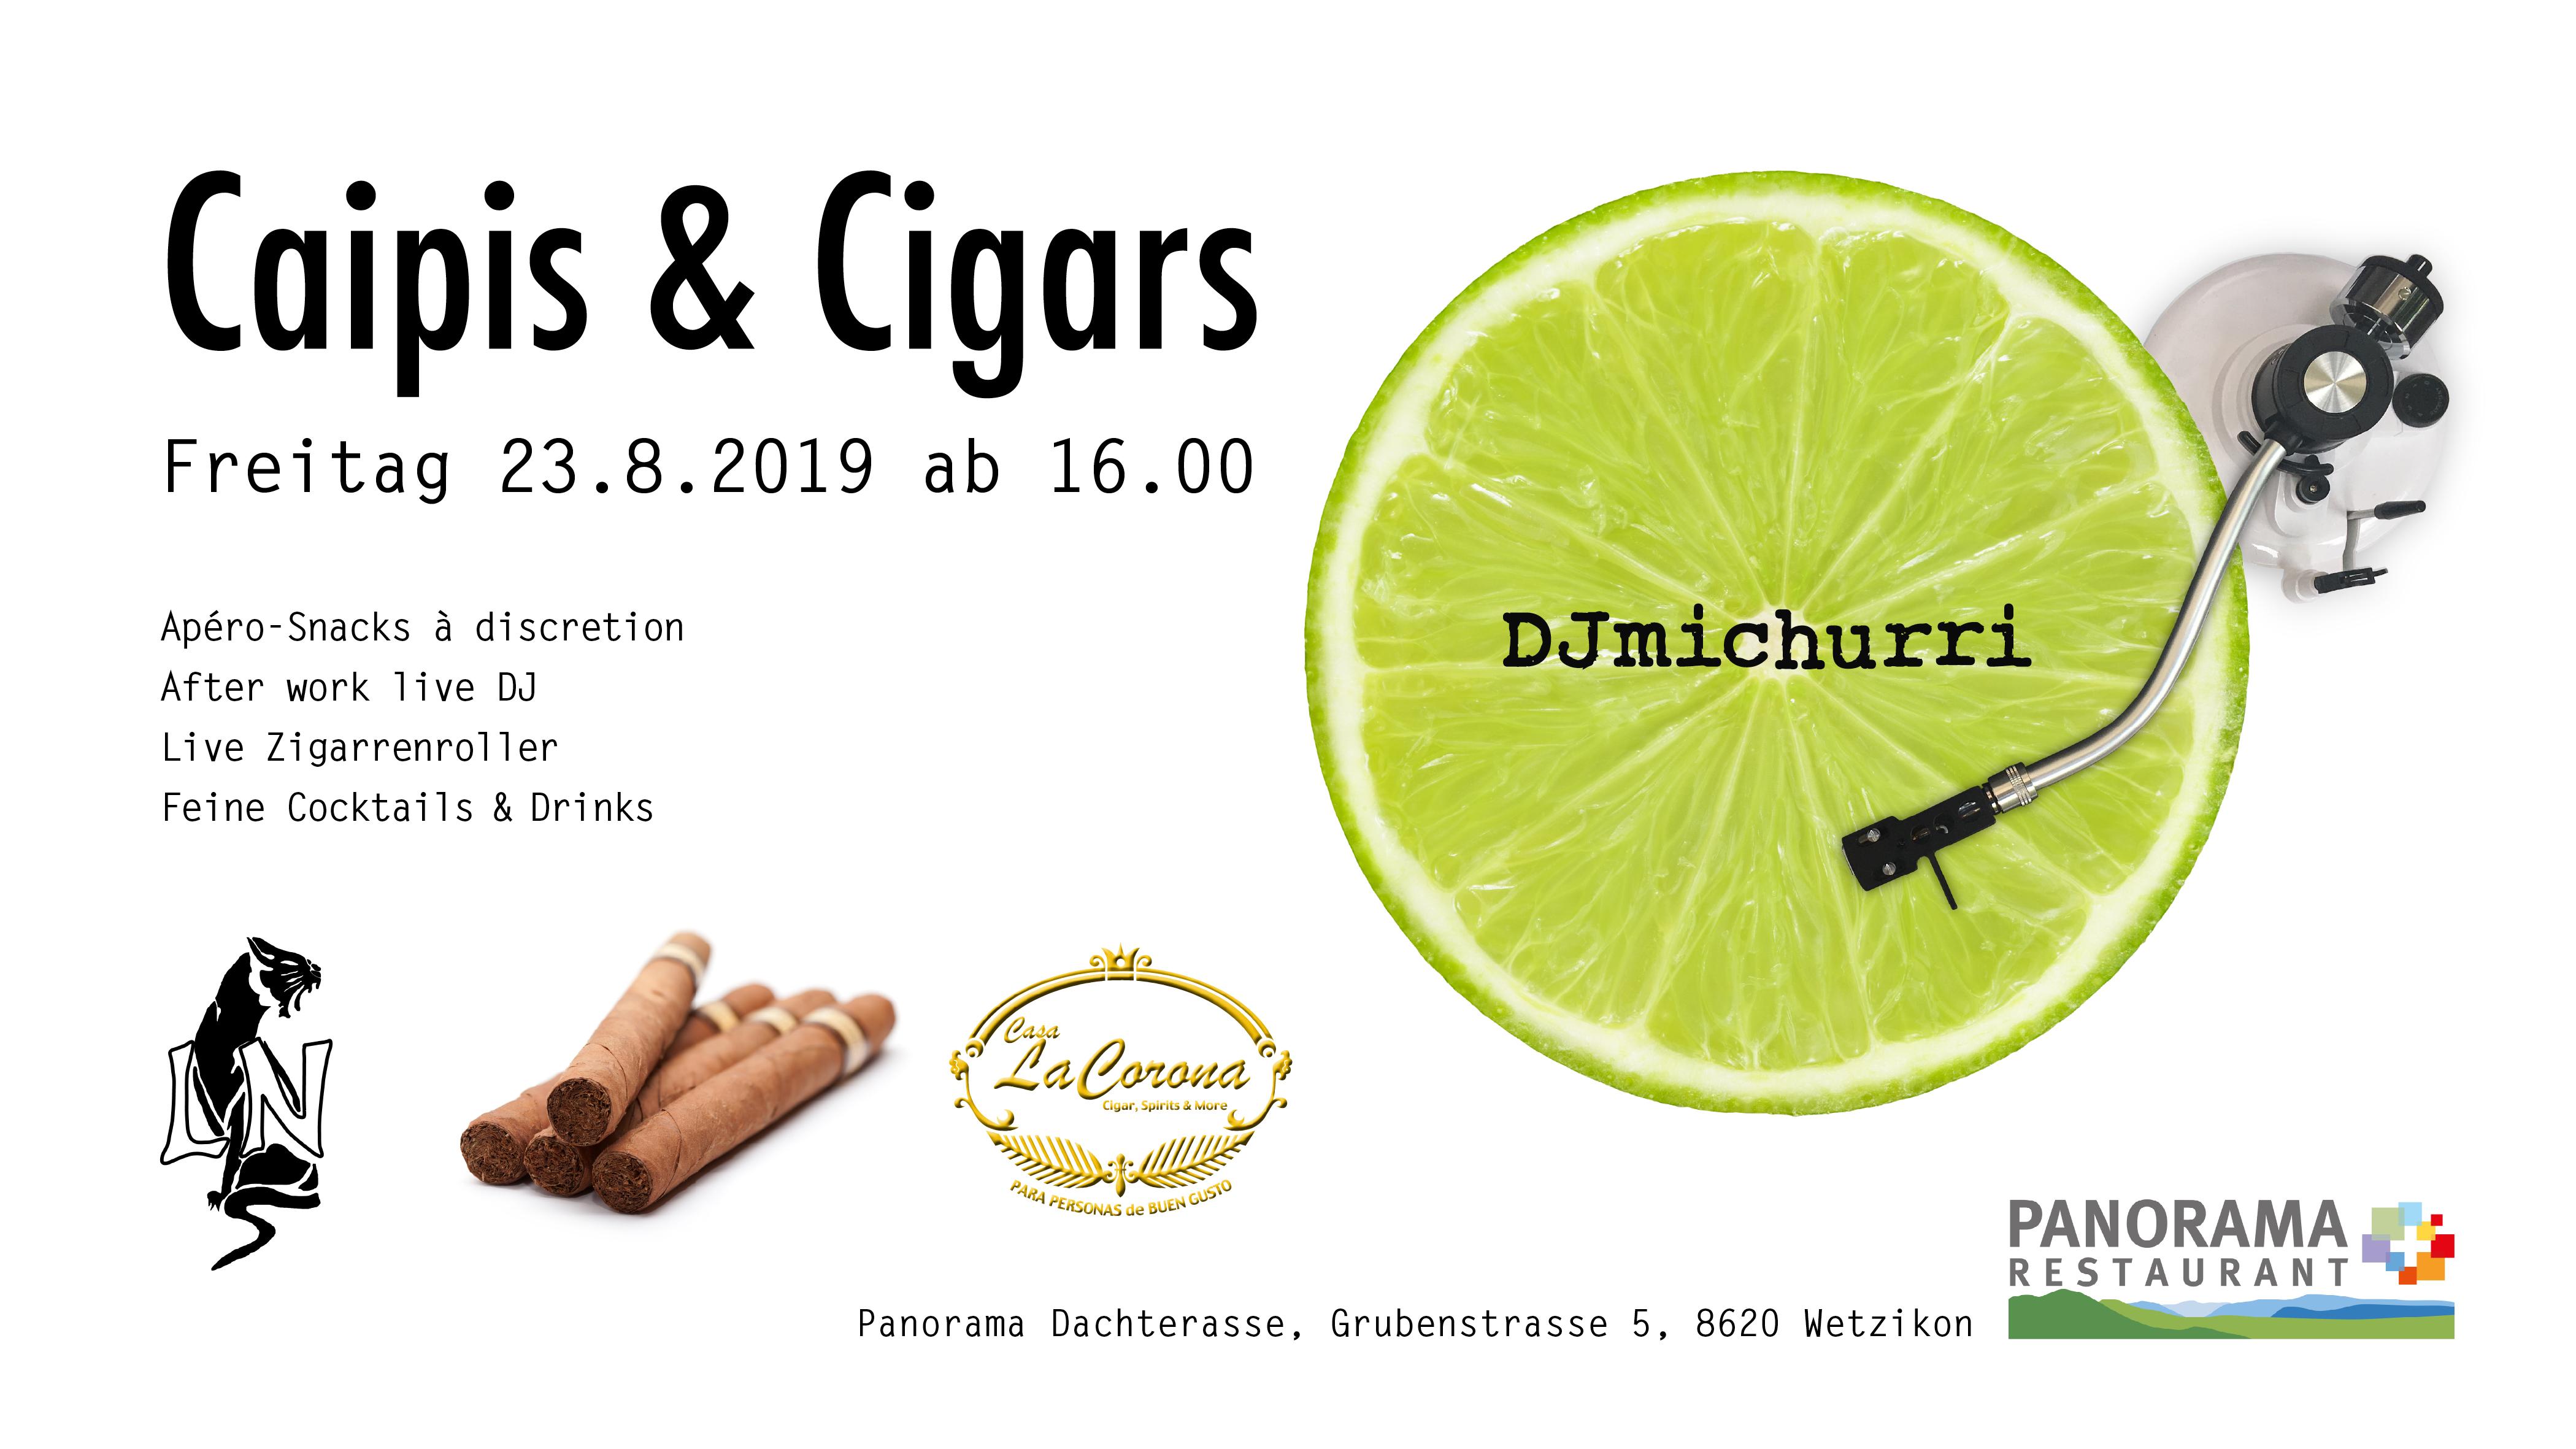 Caipis & Cigars